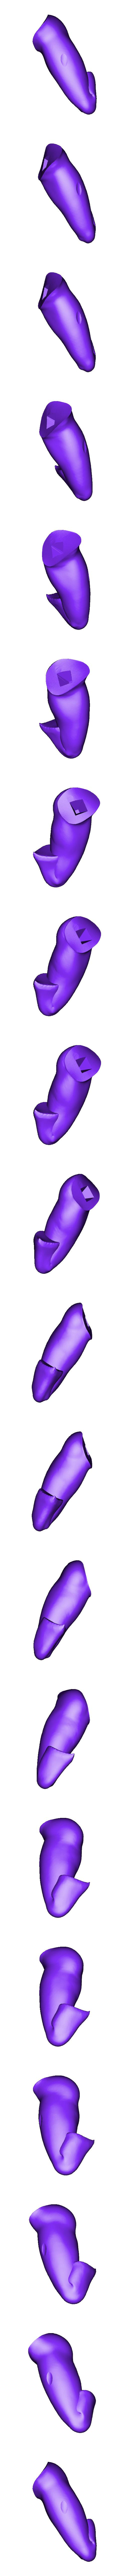 4.stl Download STL file Juri figure • Model to 3D print, RubenCastanho